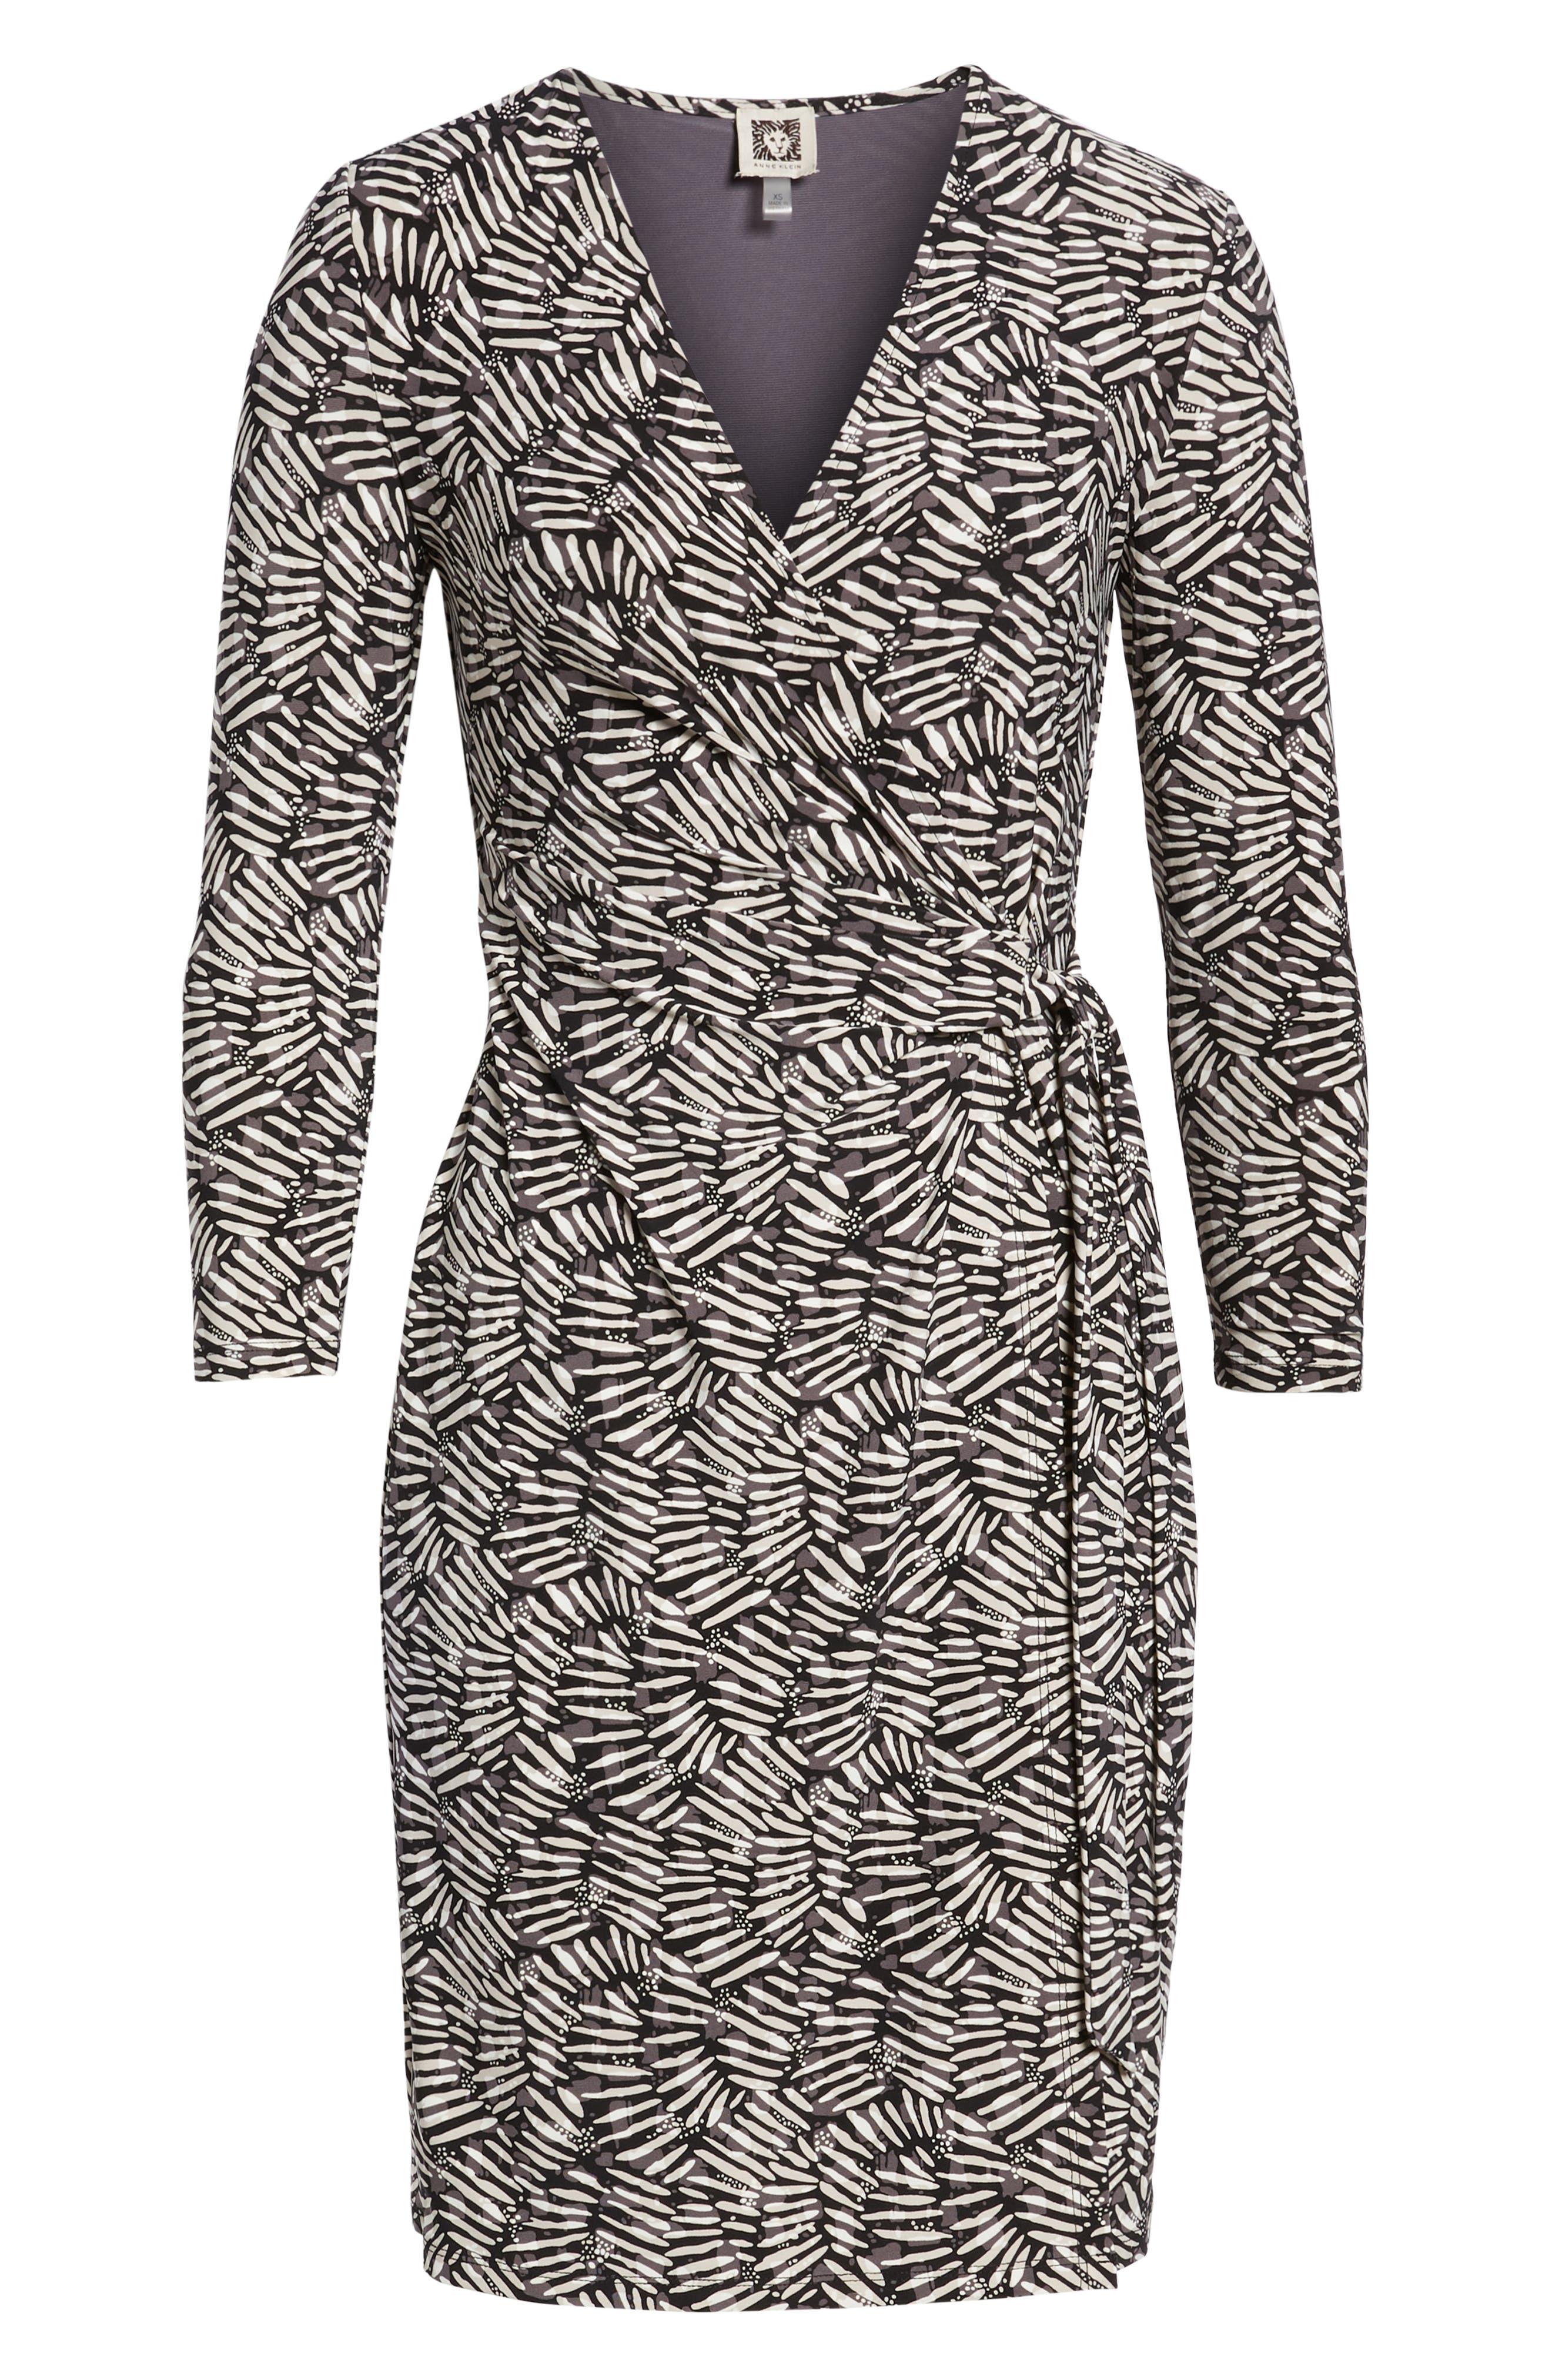 Cedarwood Stretch Crepe Faux Wrap Dress,                             Alternate thumbnail 6, color,                             Black/ Oyster Shell Combo